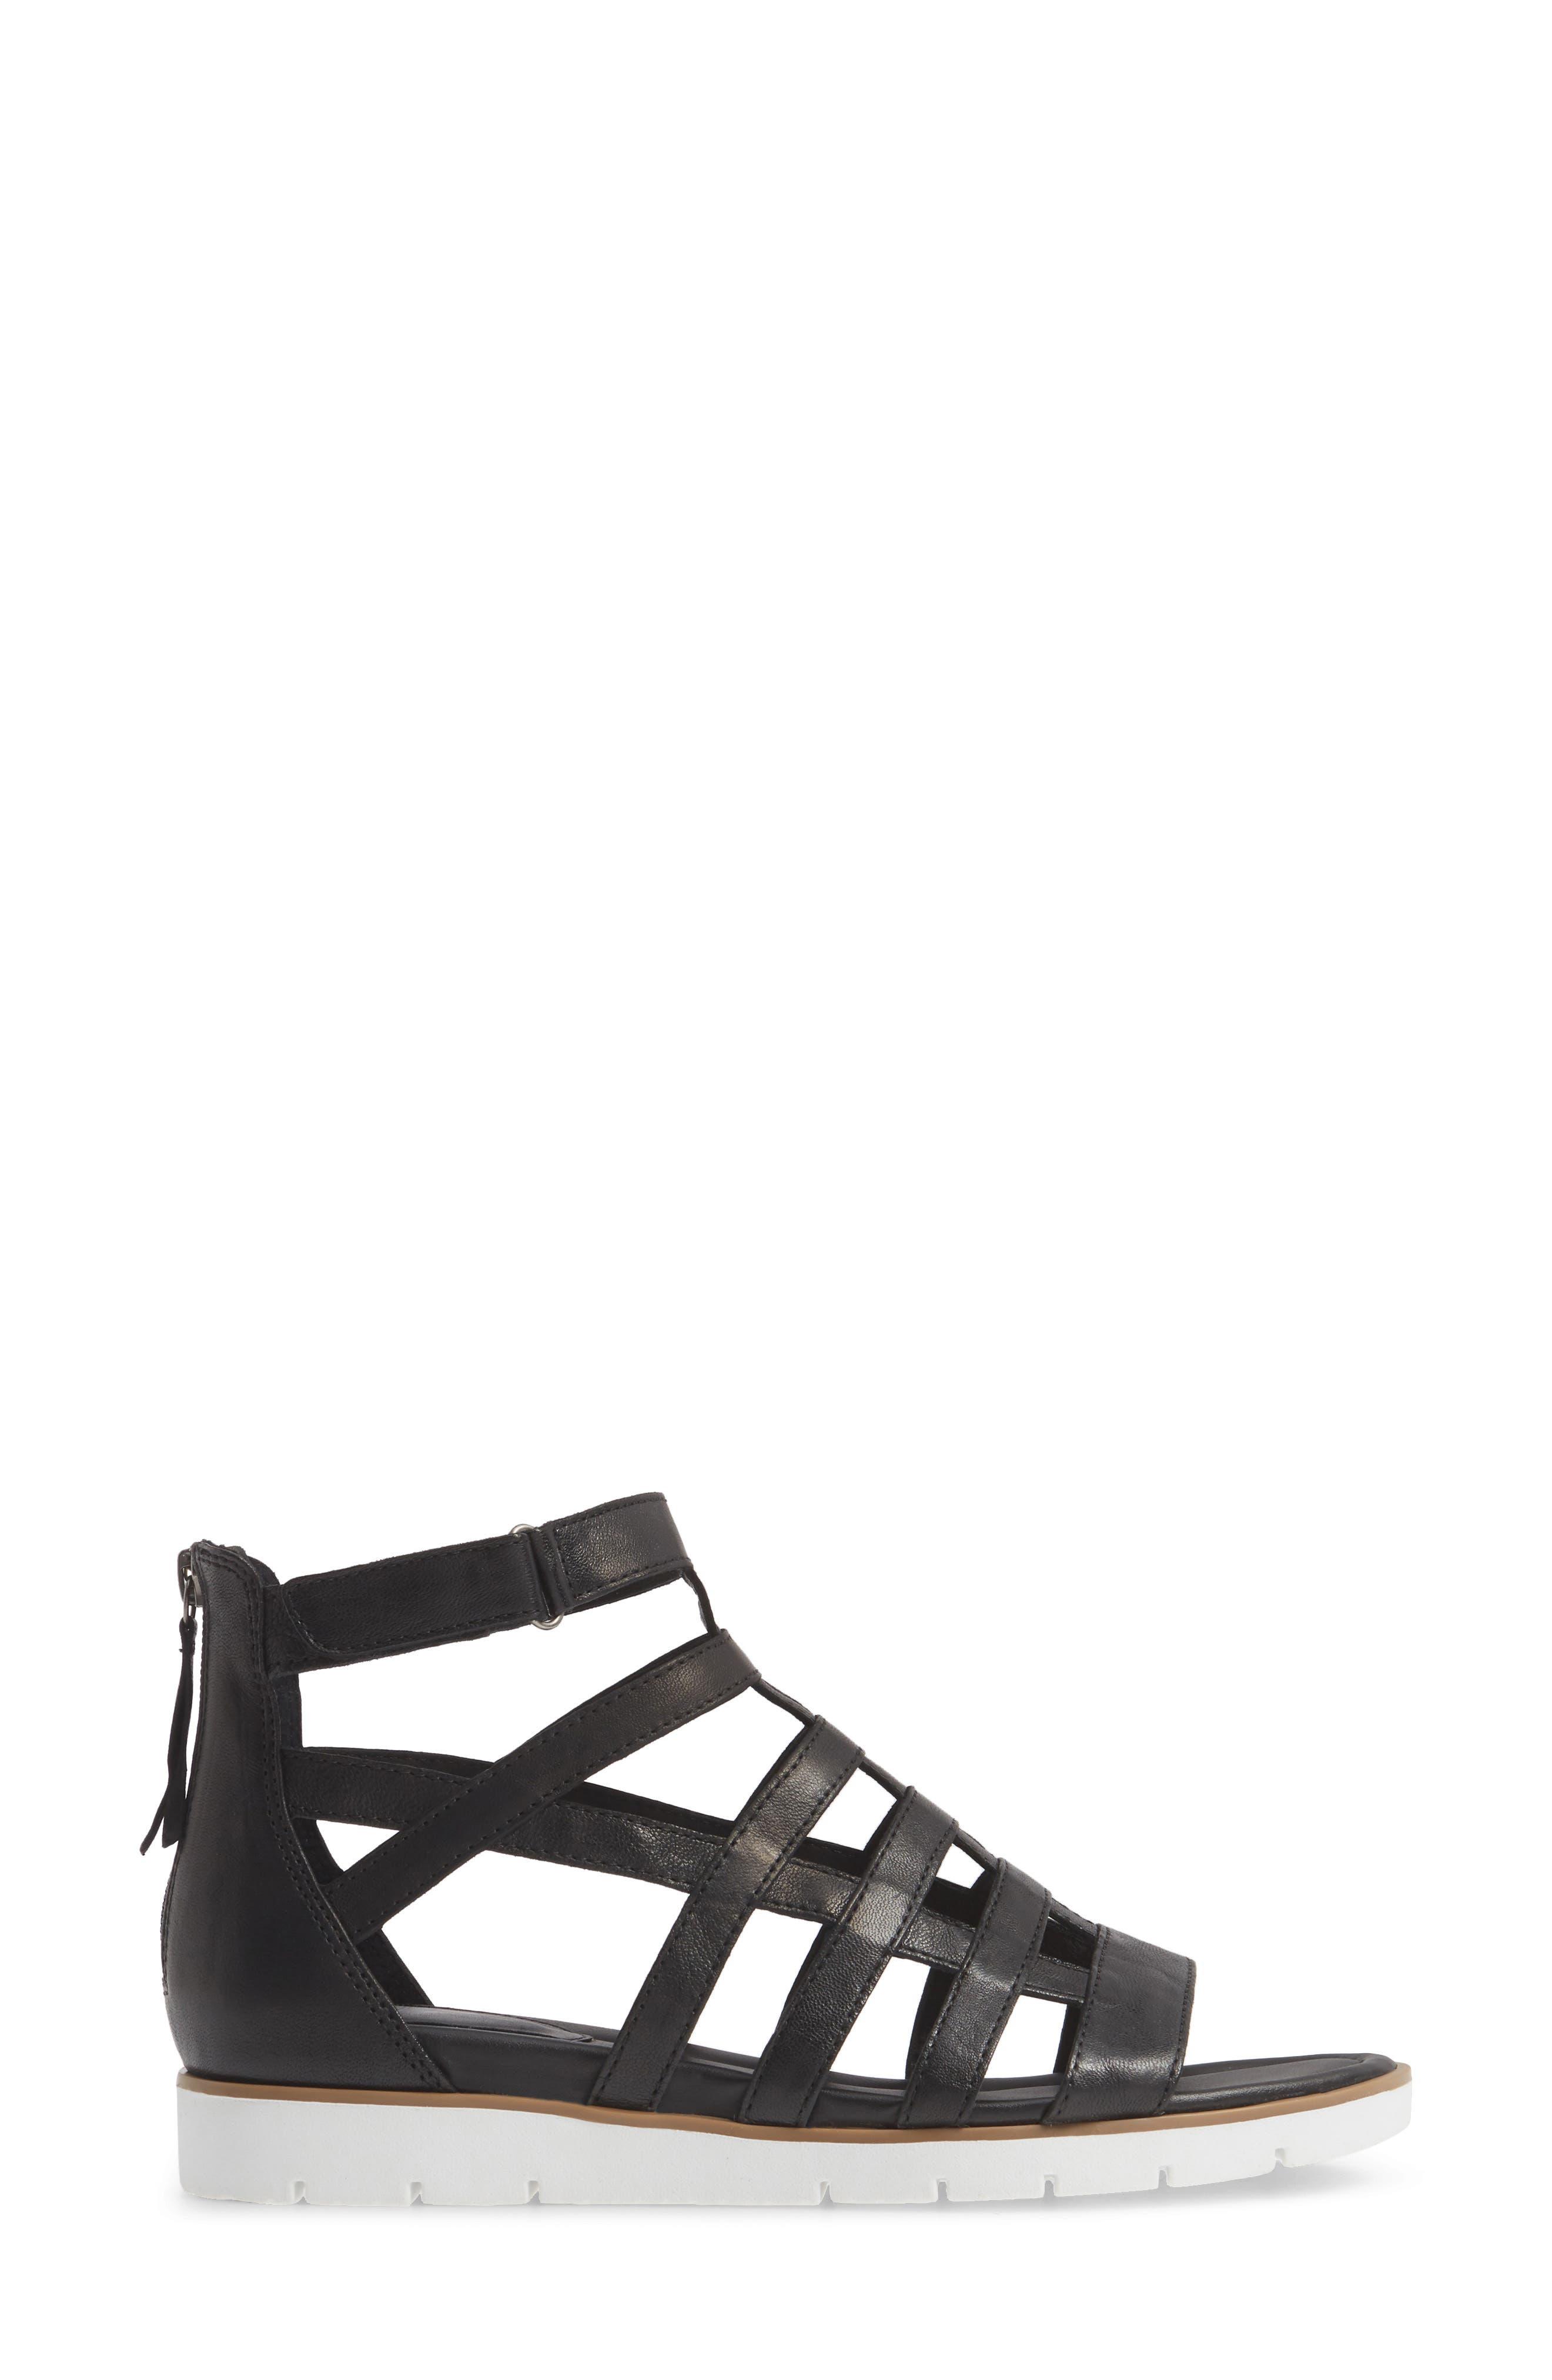 SÖFFT, Mahari Gladiator Sandal, Alternate thumbnail 3, color, BLACK LEATHER